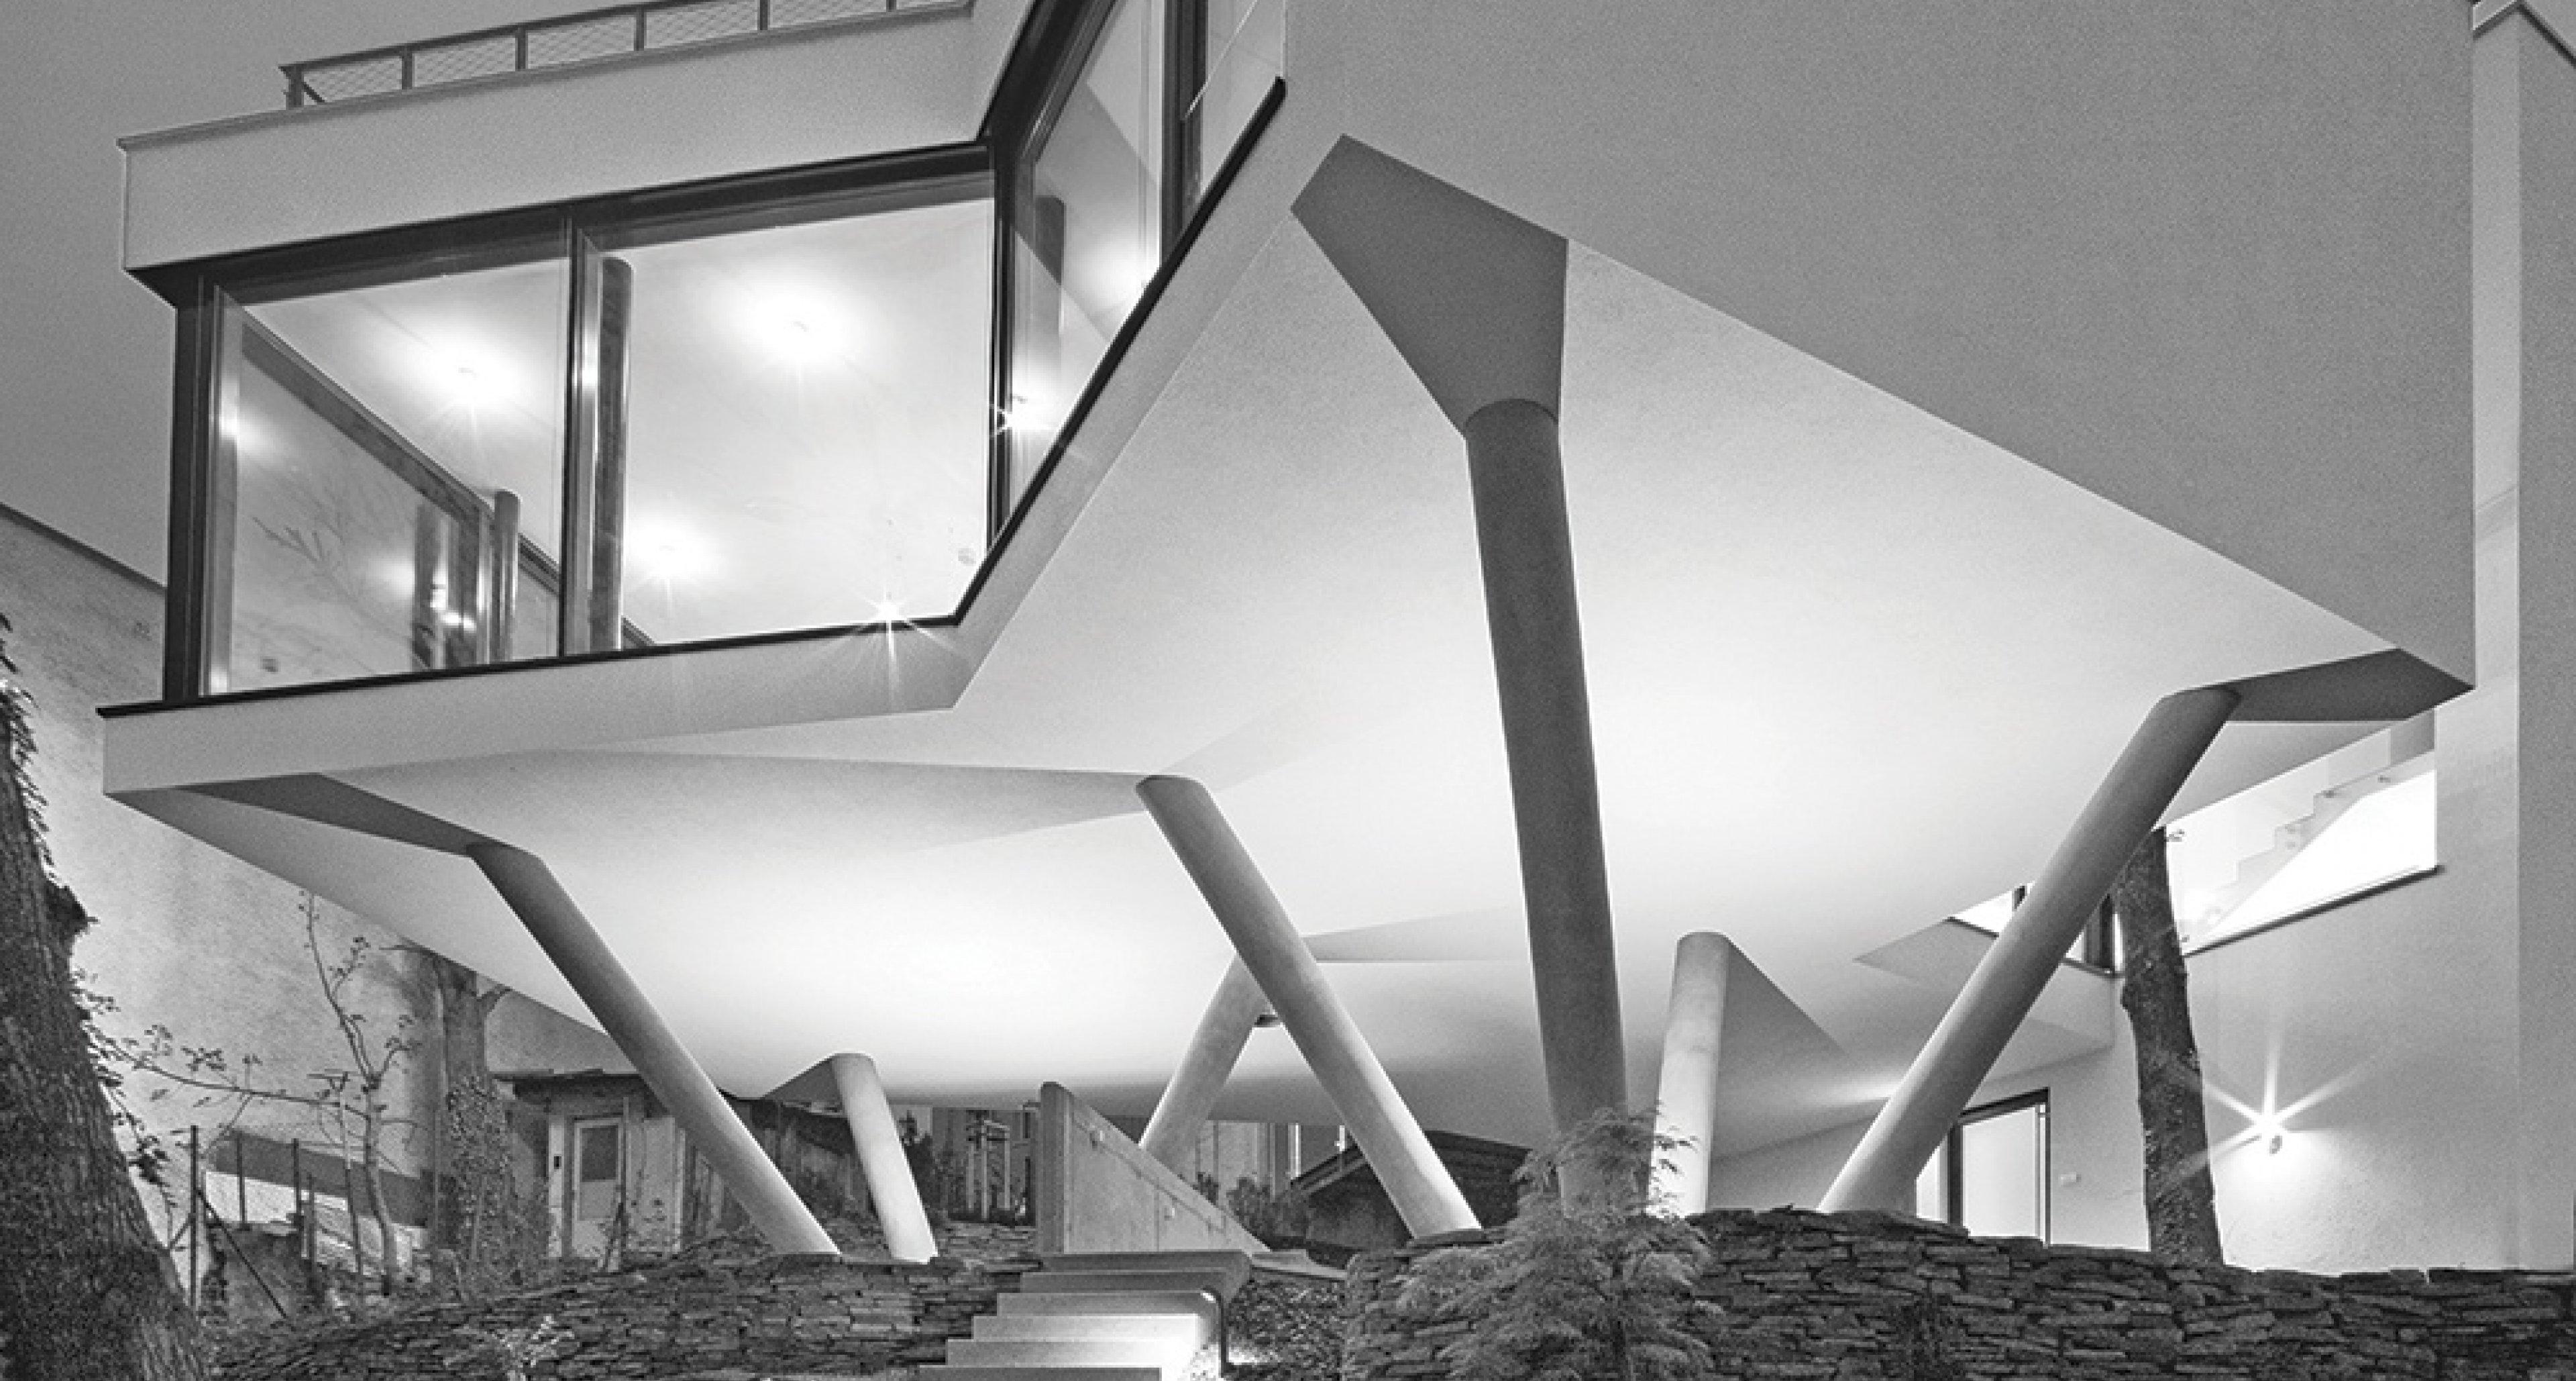 Šebo Lichý Architects: House Among the Trees, Bratislava, Slovakia, 2013. Picture credit: Photo © Tomáš Manina